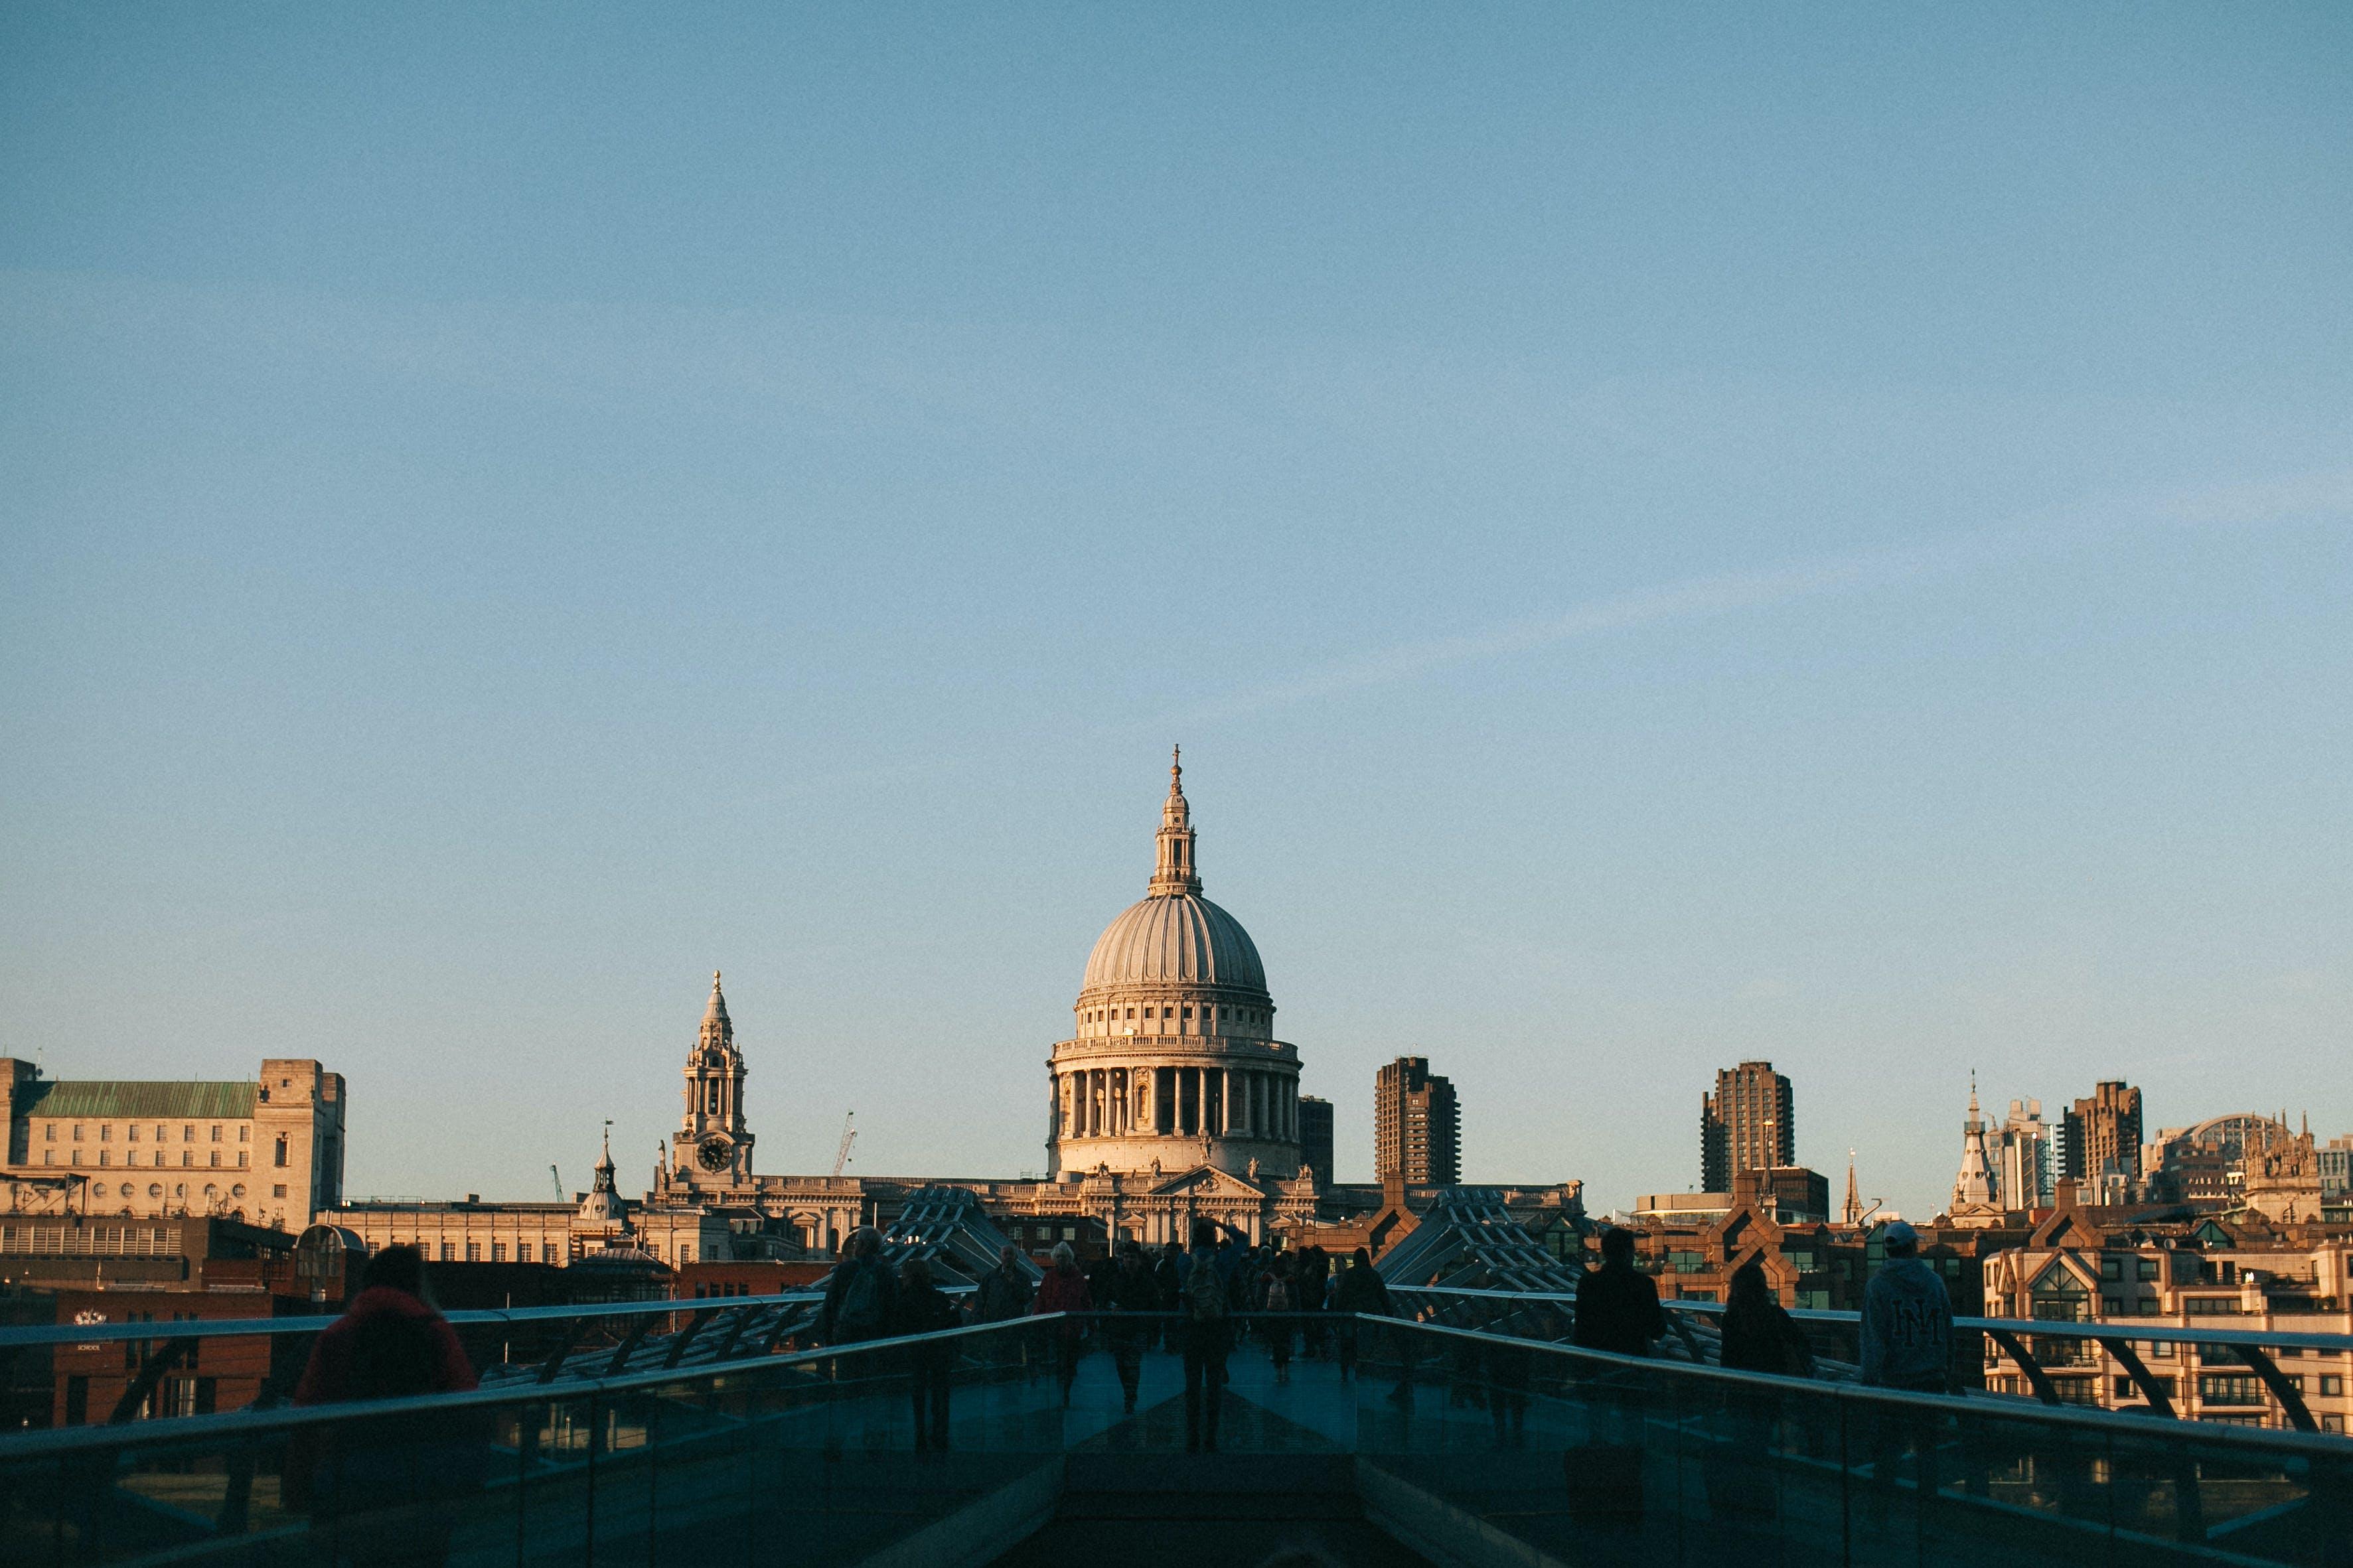 Gratis lagerfoto af administration, arkitektur, bro, by